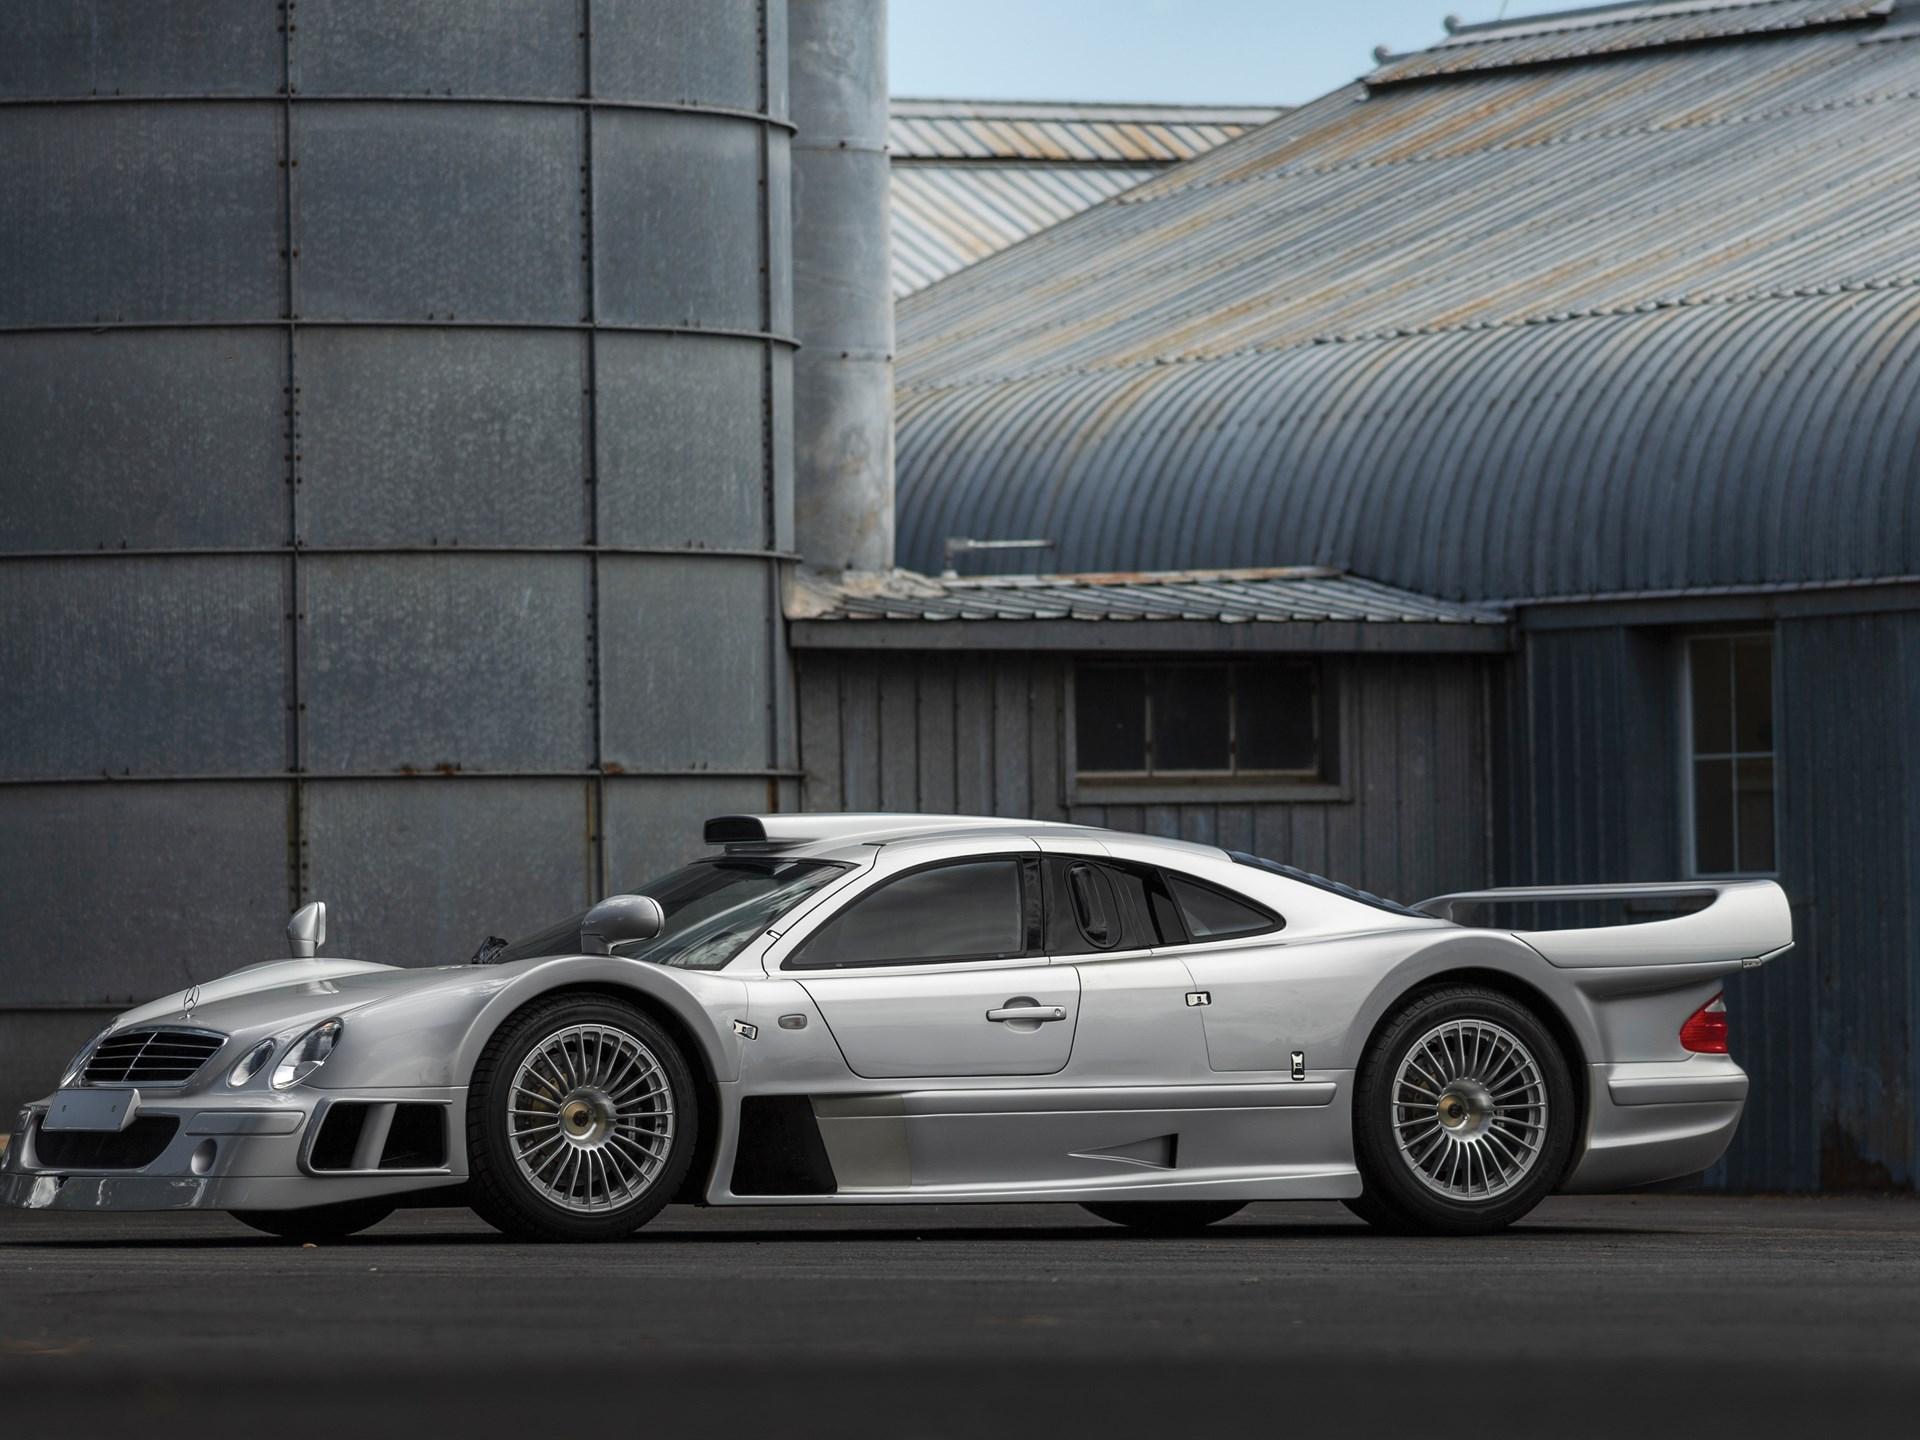 1998 Mercedes-Benz CLK GTR siver 3/4 front